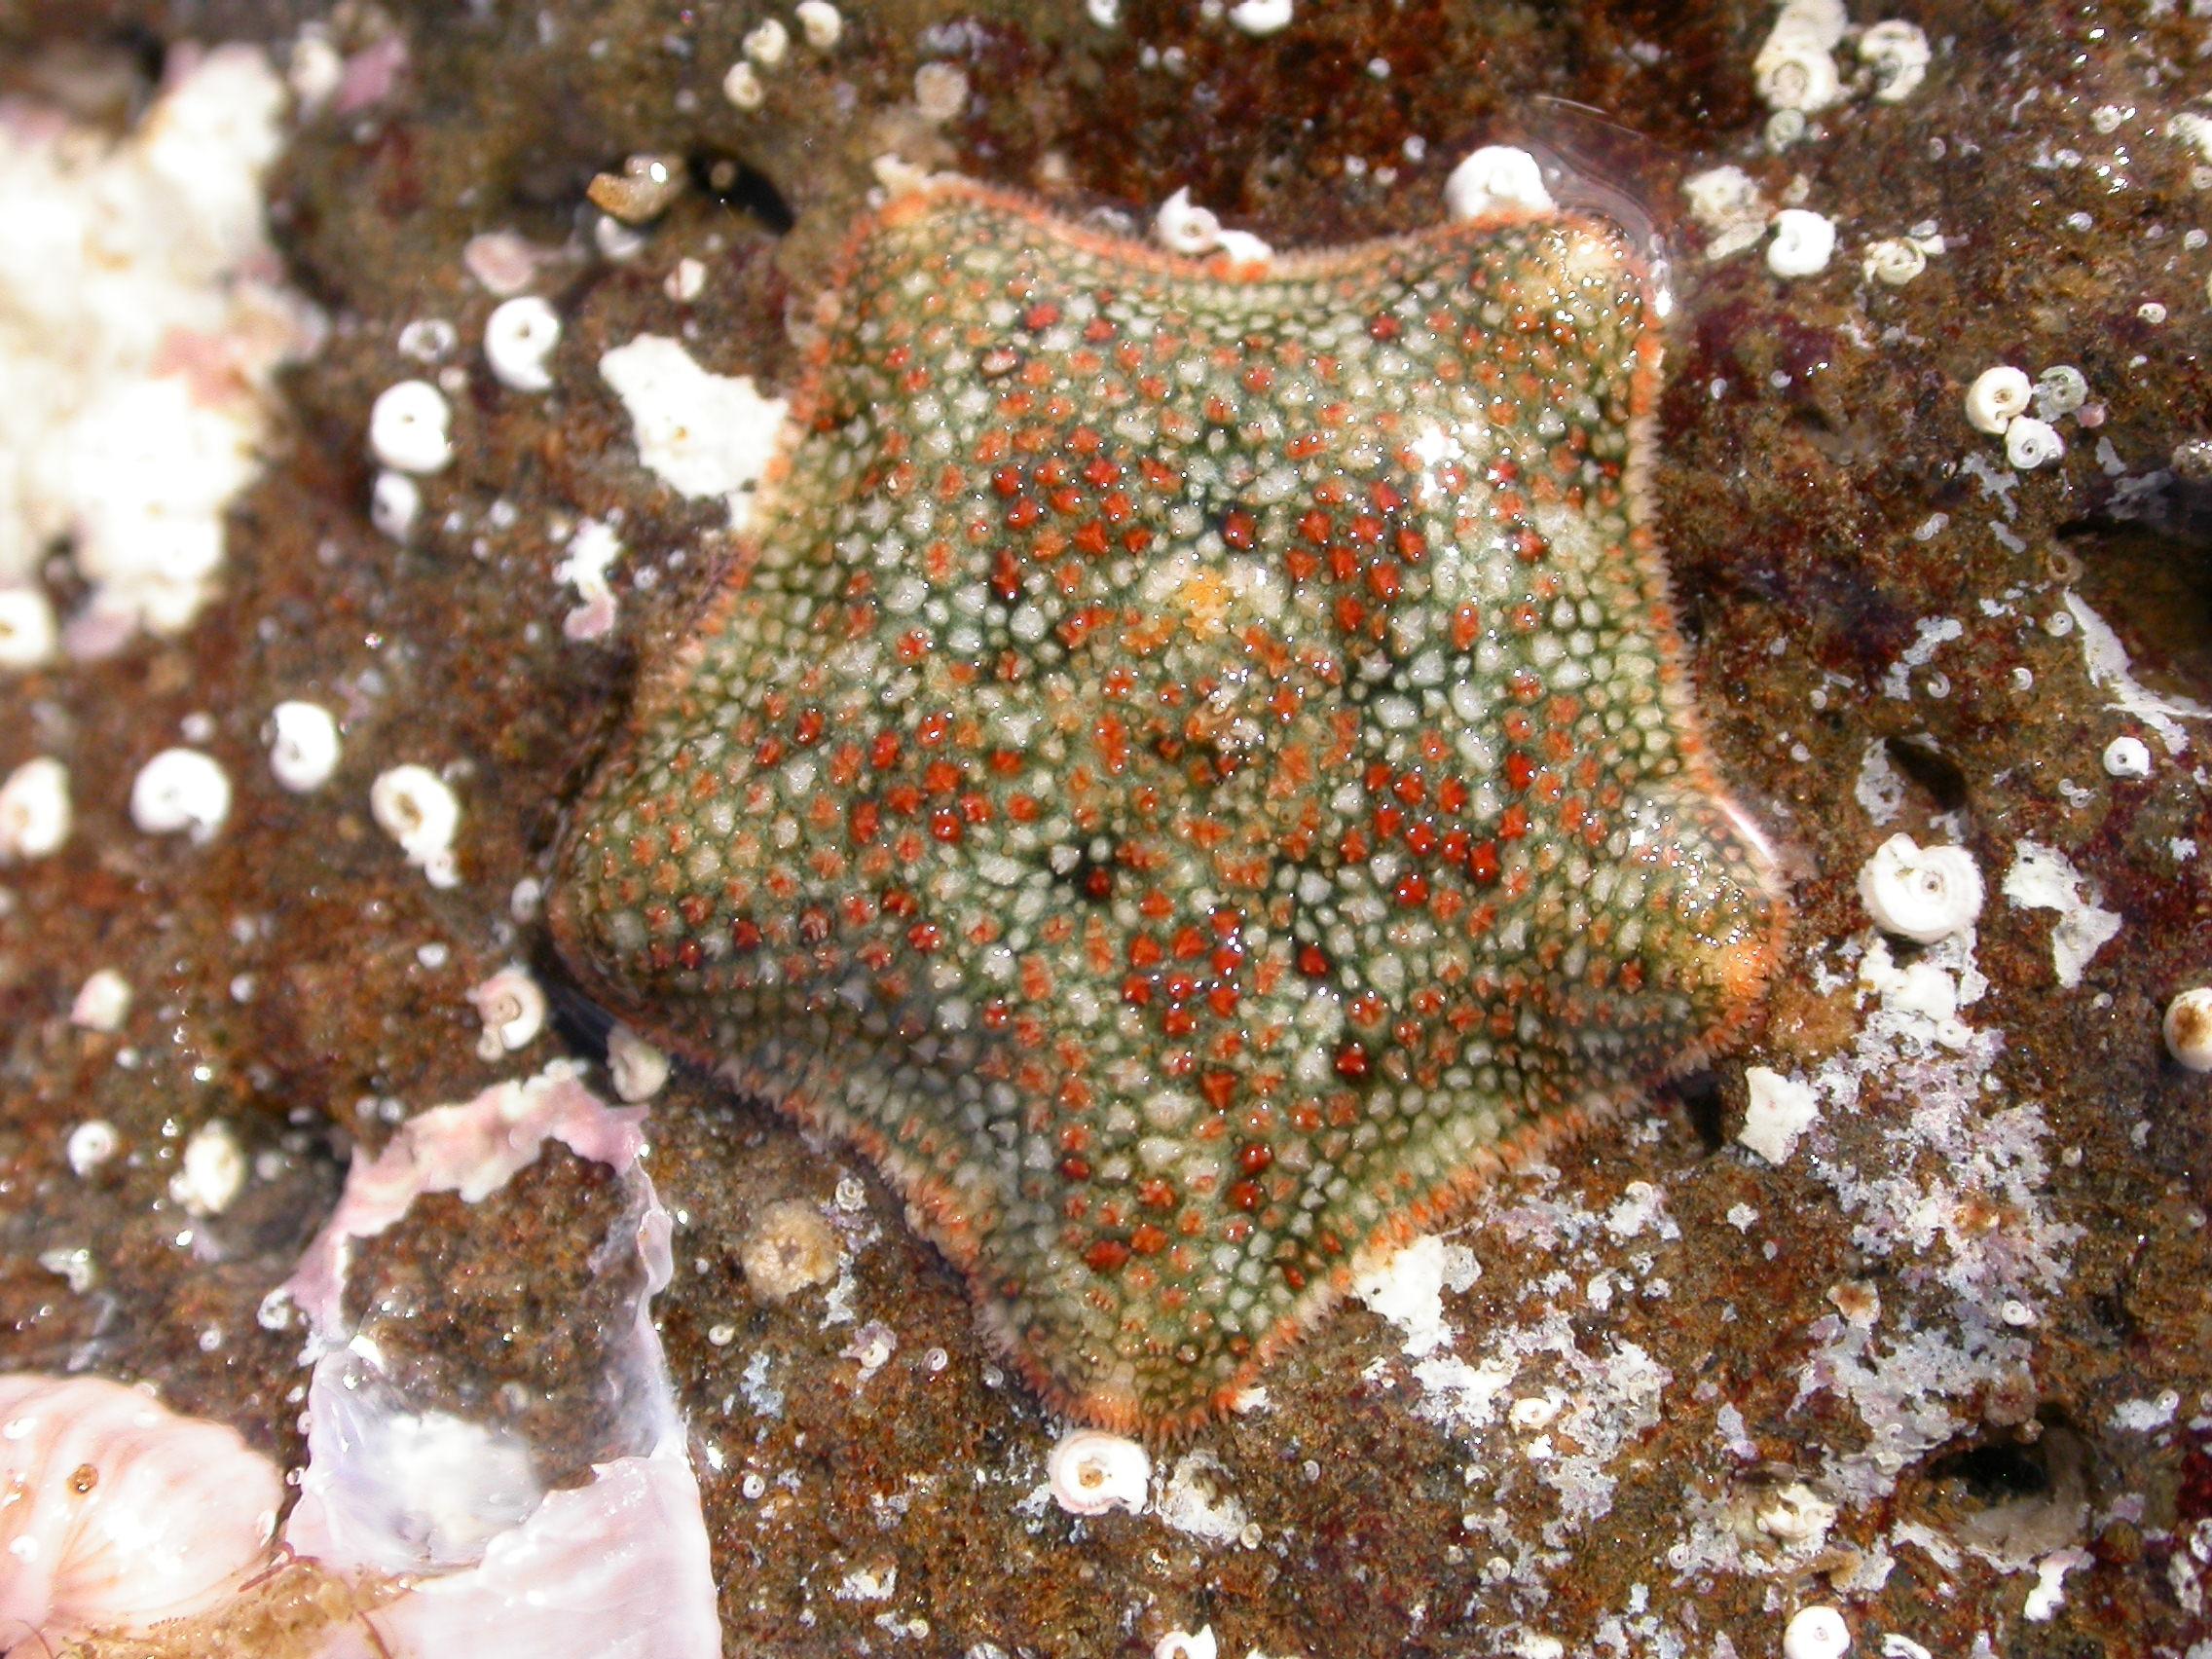 Ejemplar de una estrella de mar 'Asterina martinbarriosi'. Imagen: CSIC